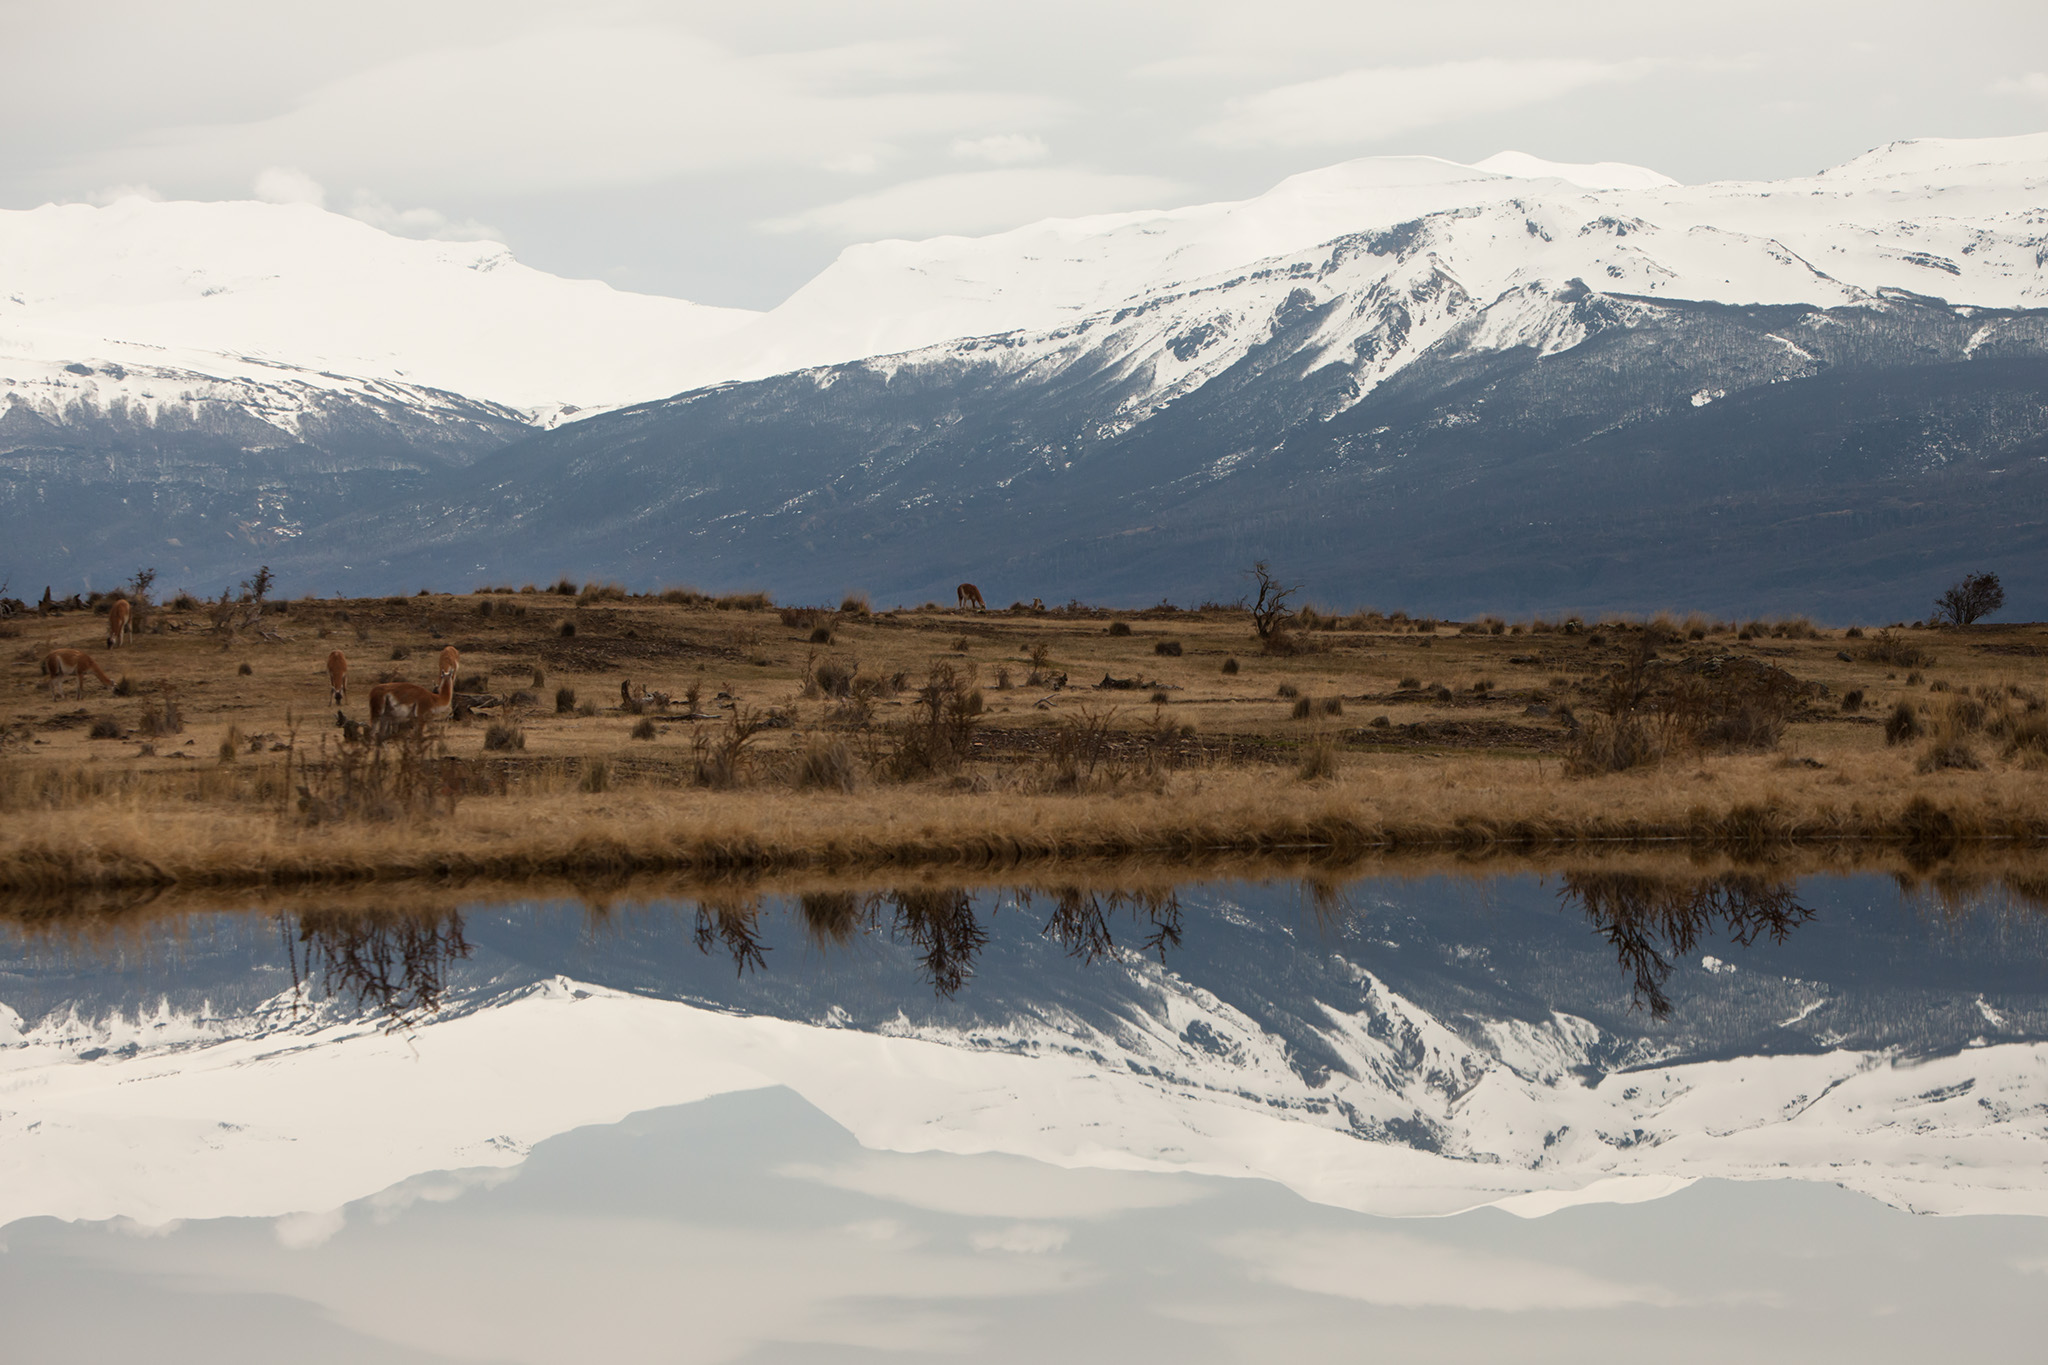 027-TW-Patagonia-140829.jpg